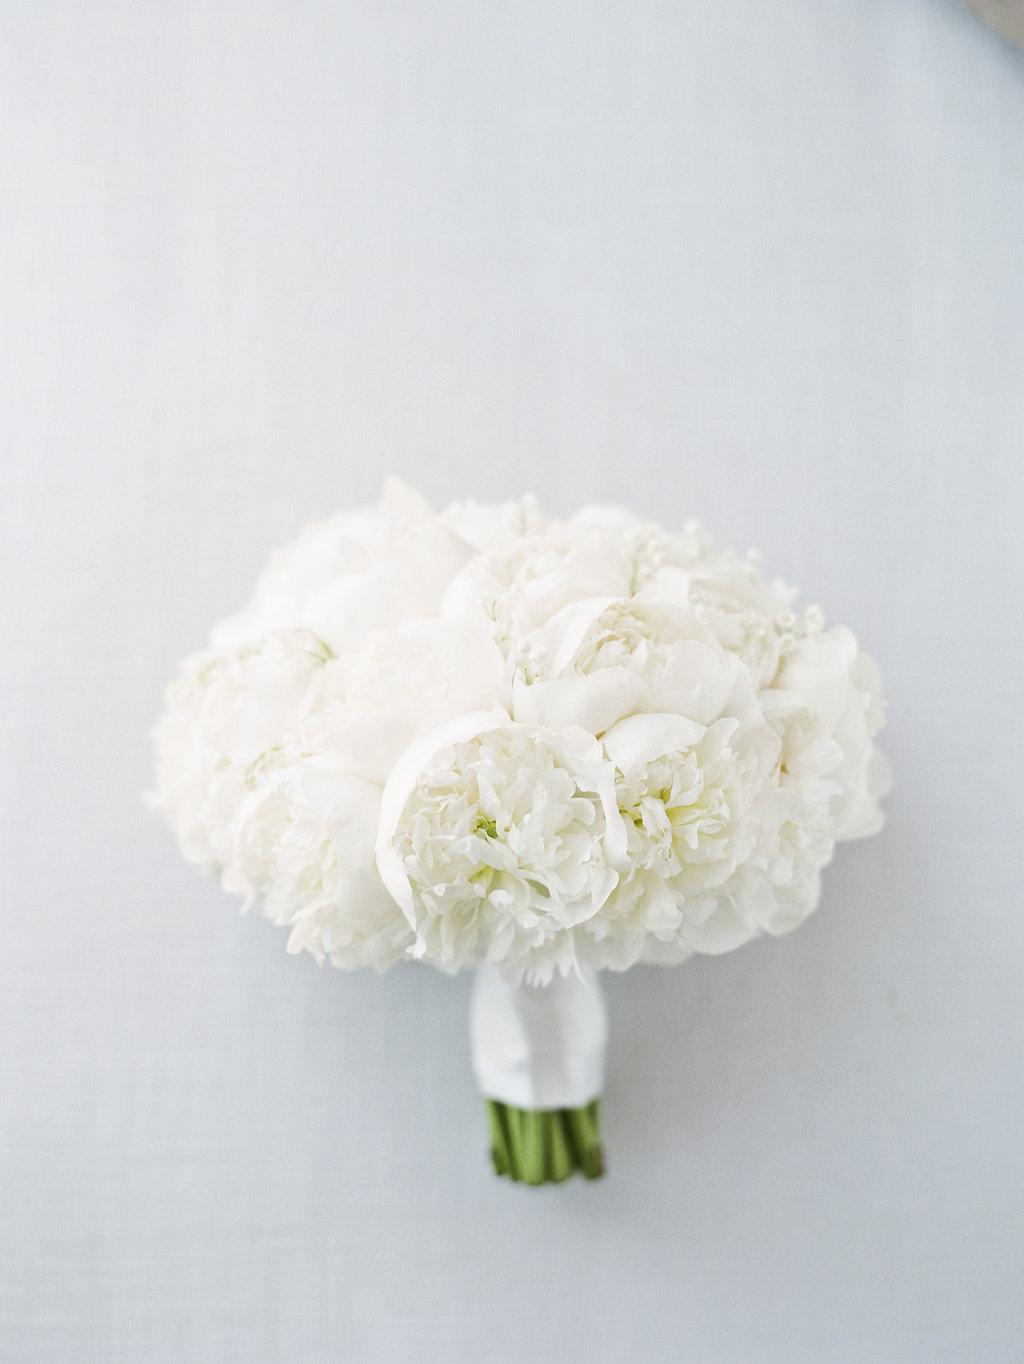 Cliveden Joanna Carter Wedding Flowers Buckinghamshire Oxfordshire Berkshire London_637